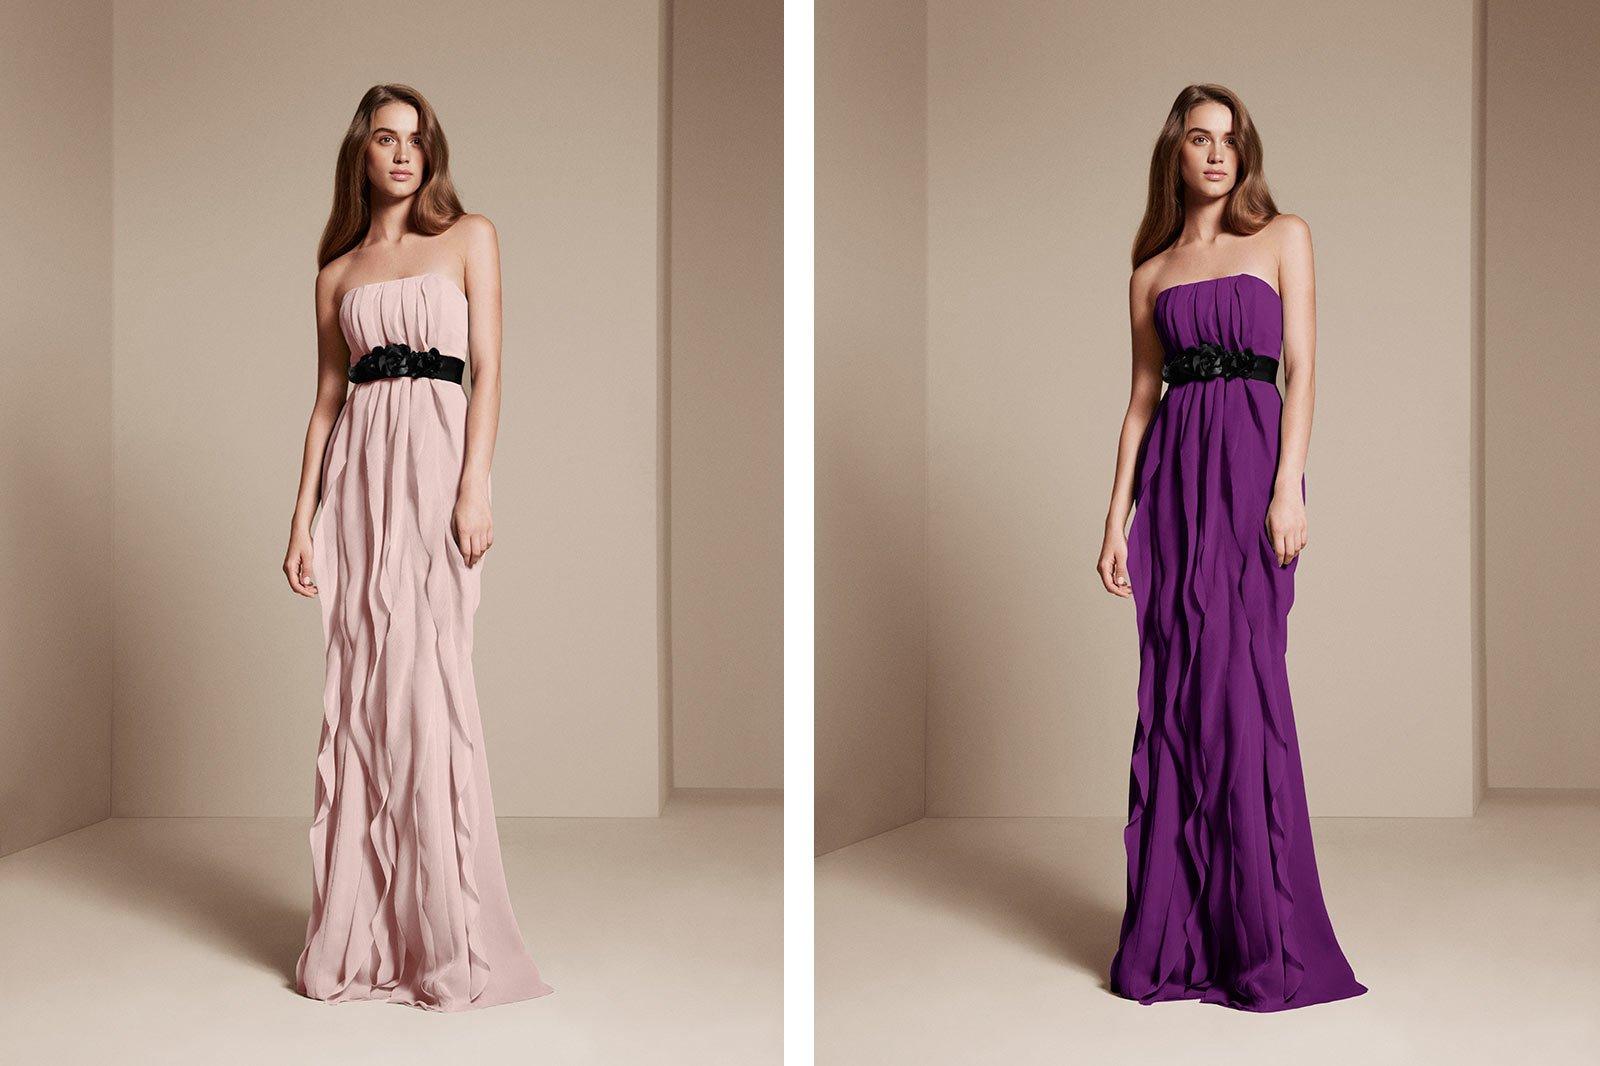 Colorways example - bridesmaid wearing bridesmaid dresses